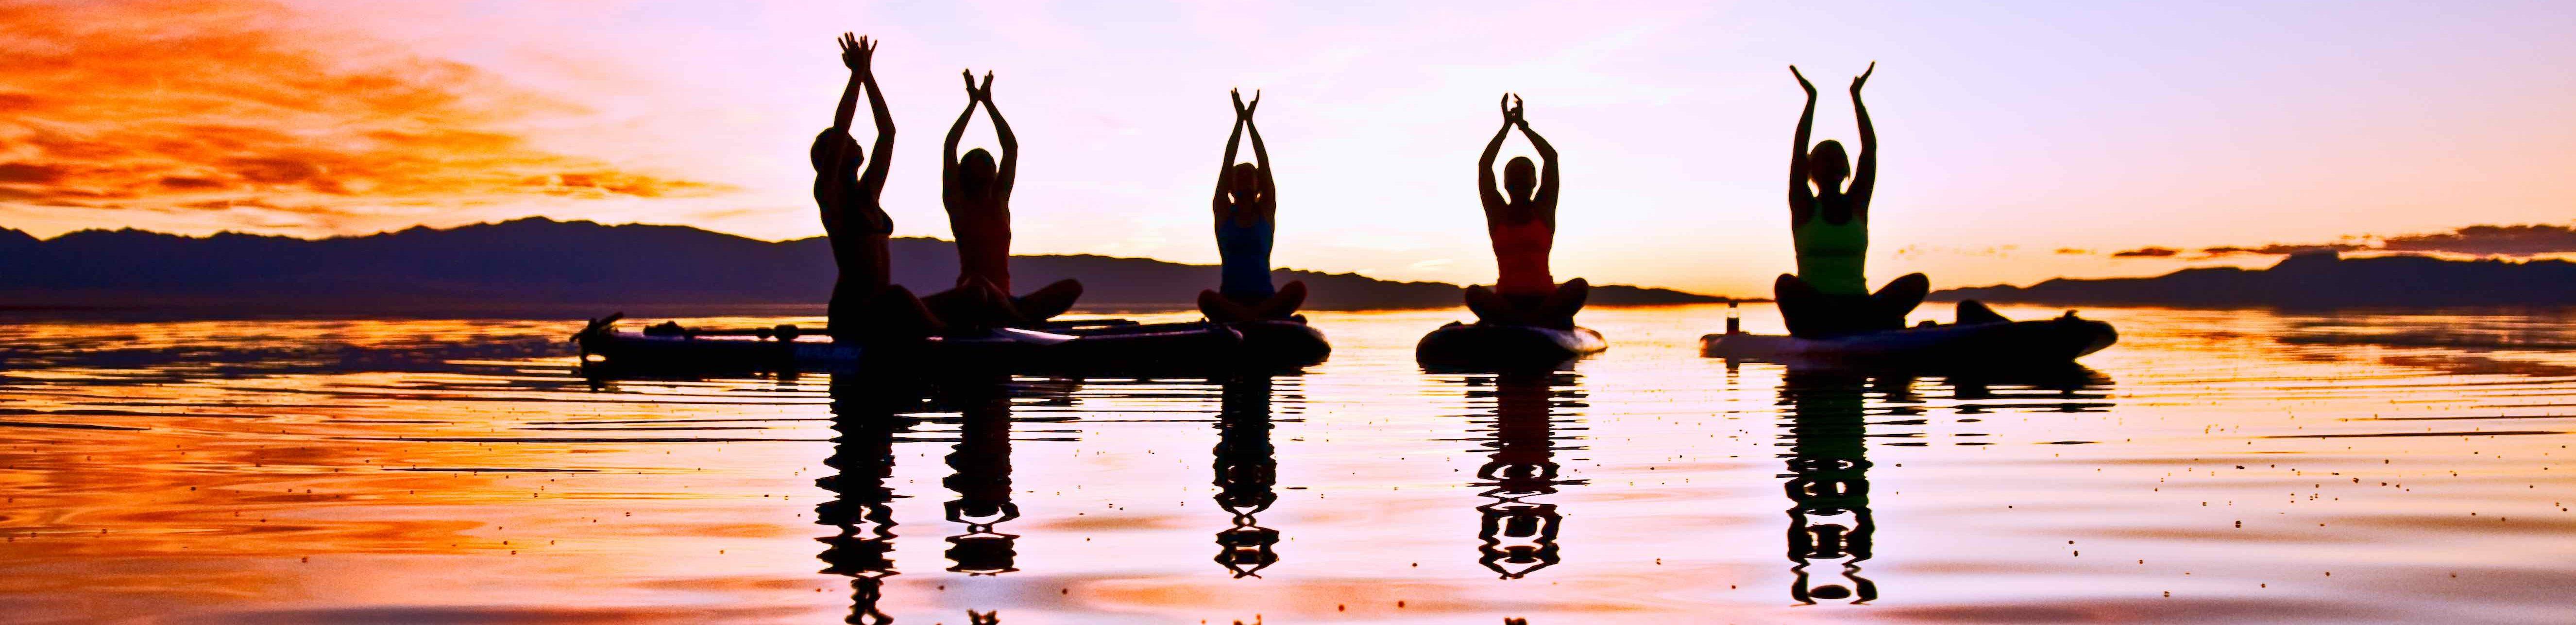 SUP Yoga & Health Retreats